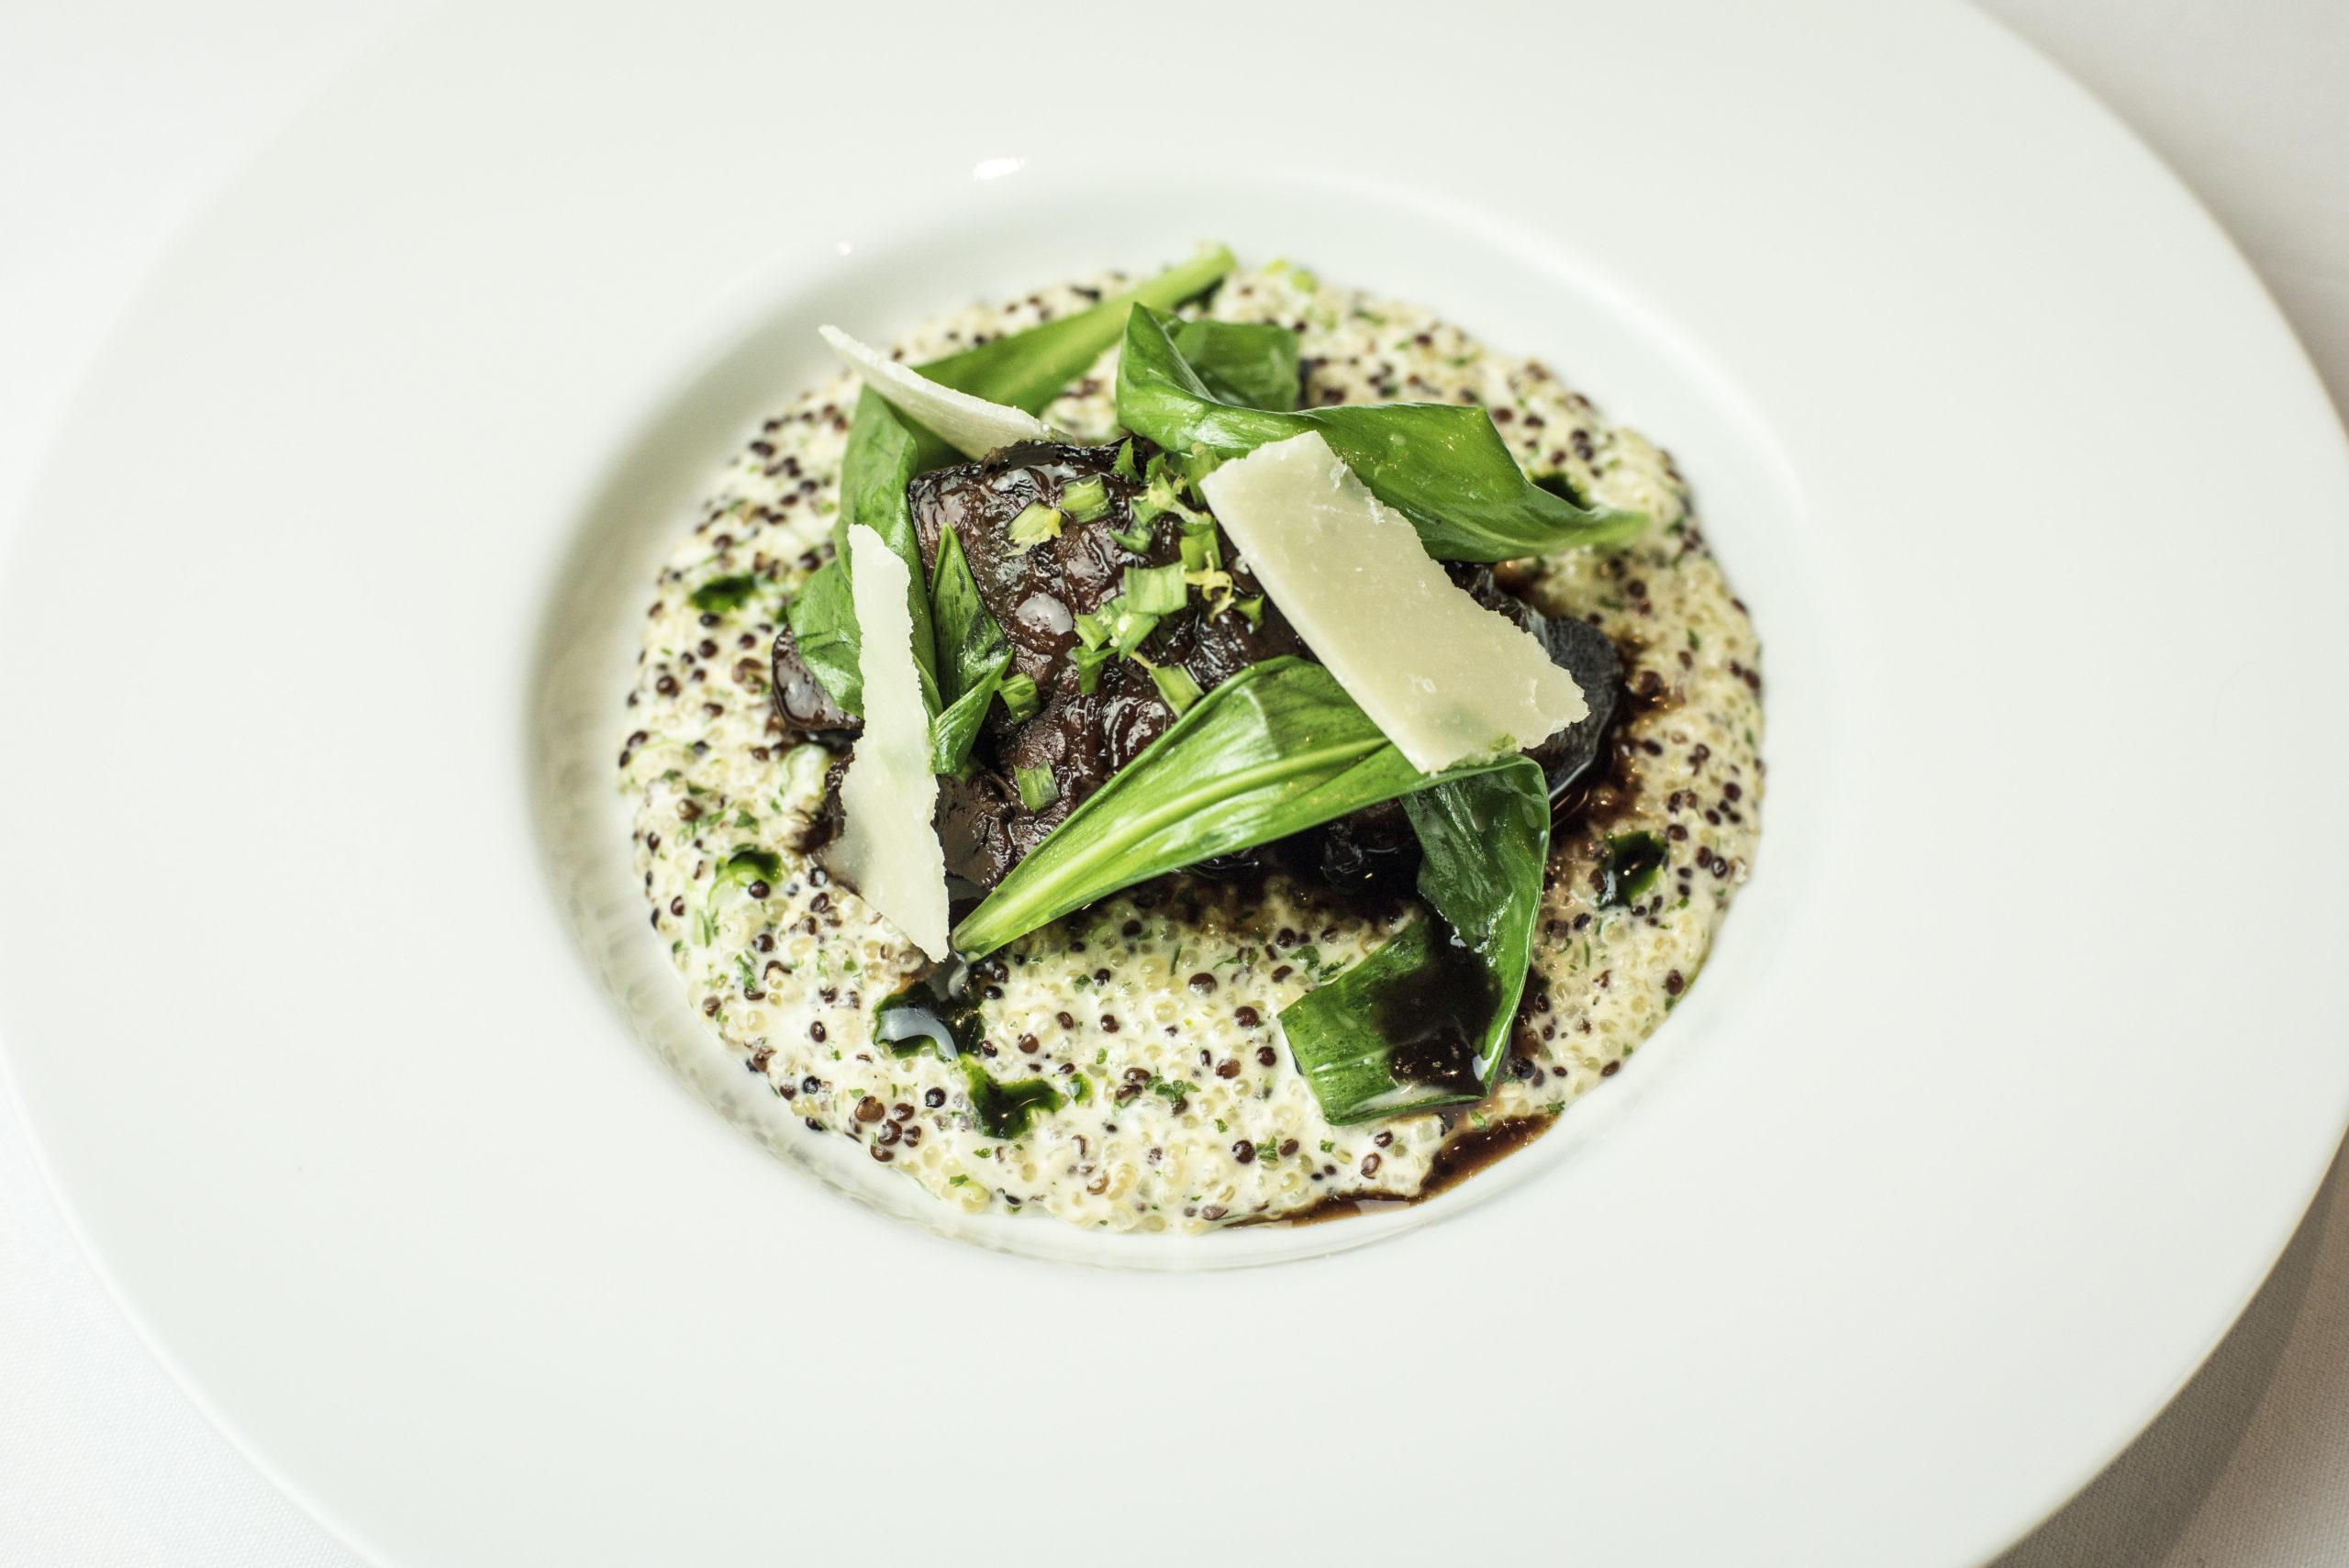 Slow-cooked Irish beef shin with quinoa, wild garlic and Parmesan